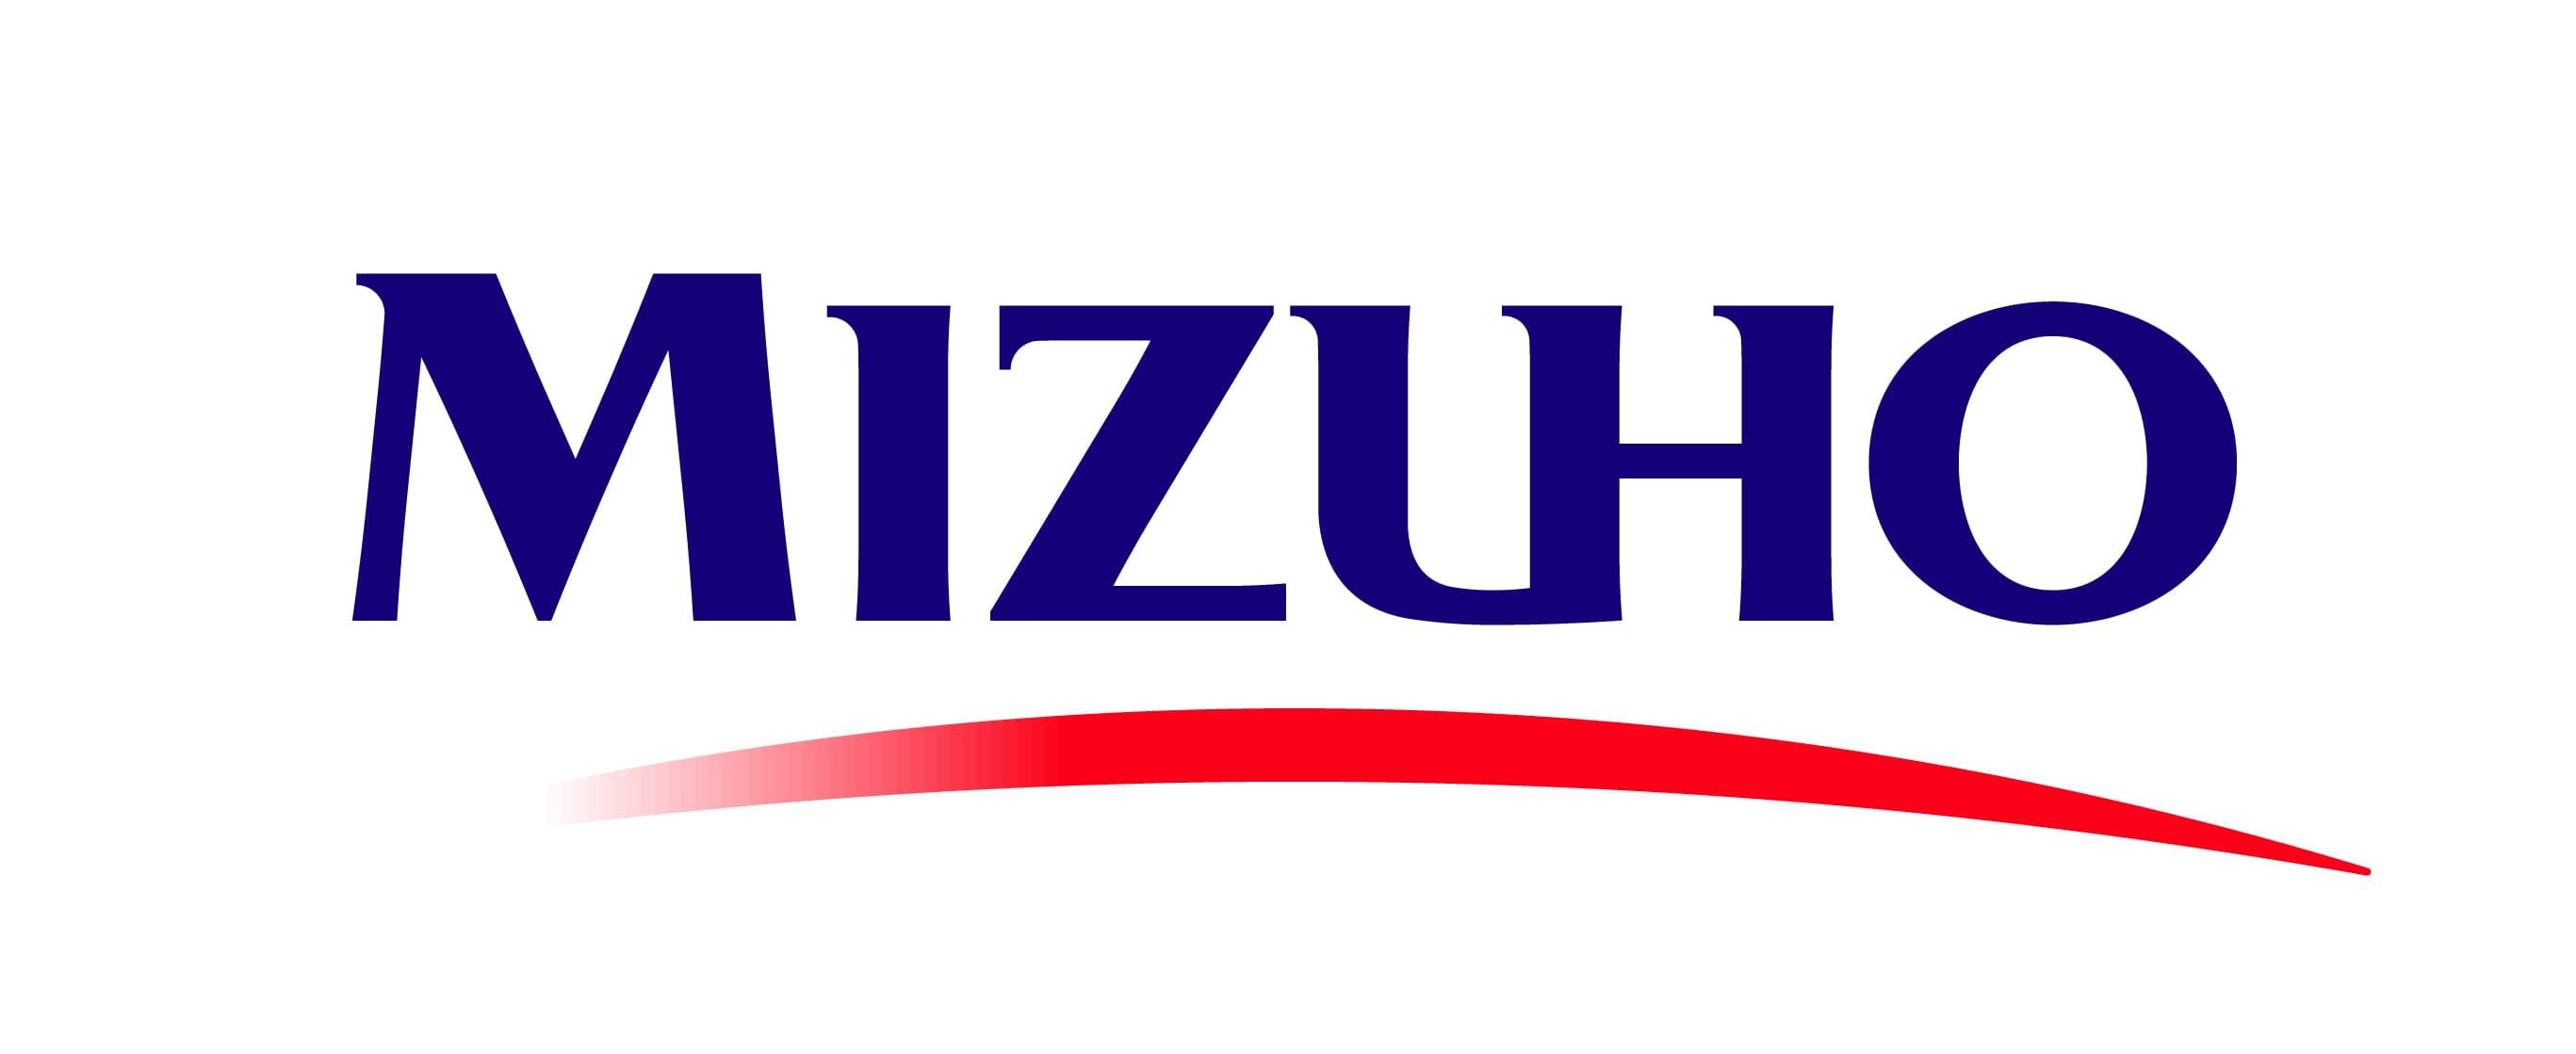 Mizuho ロゴ